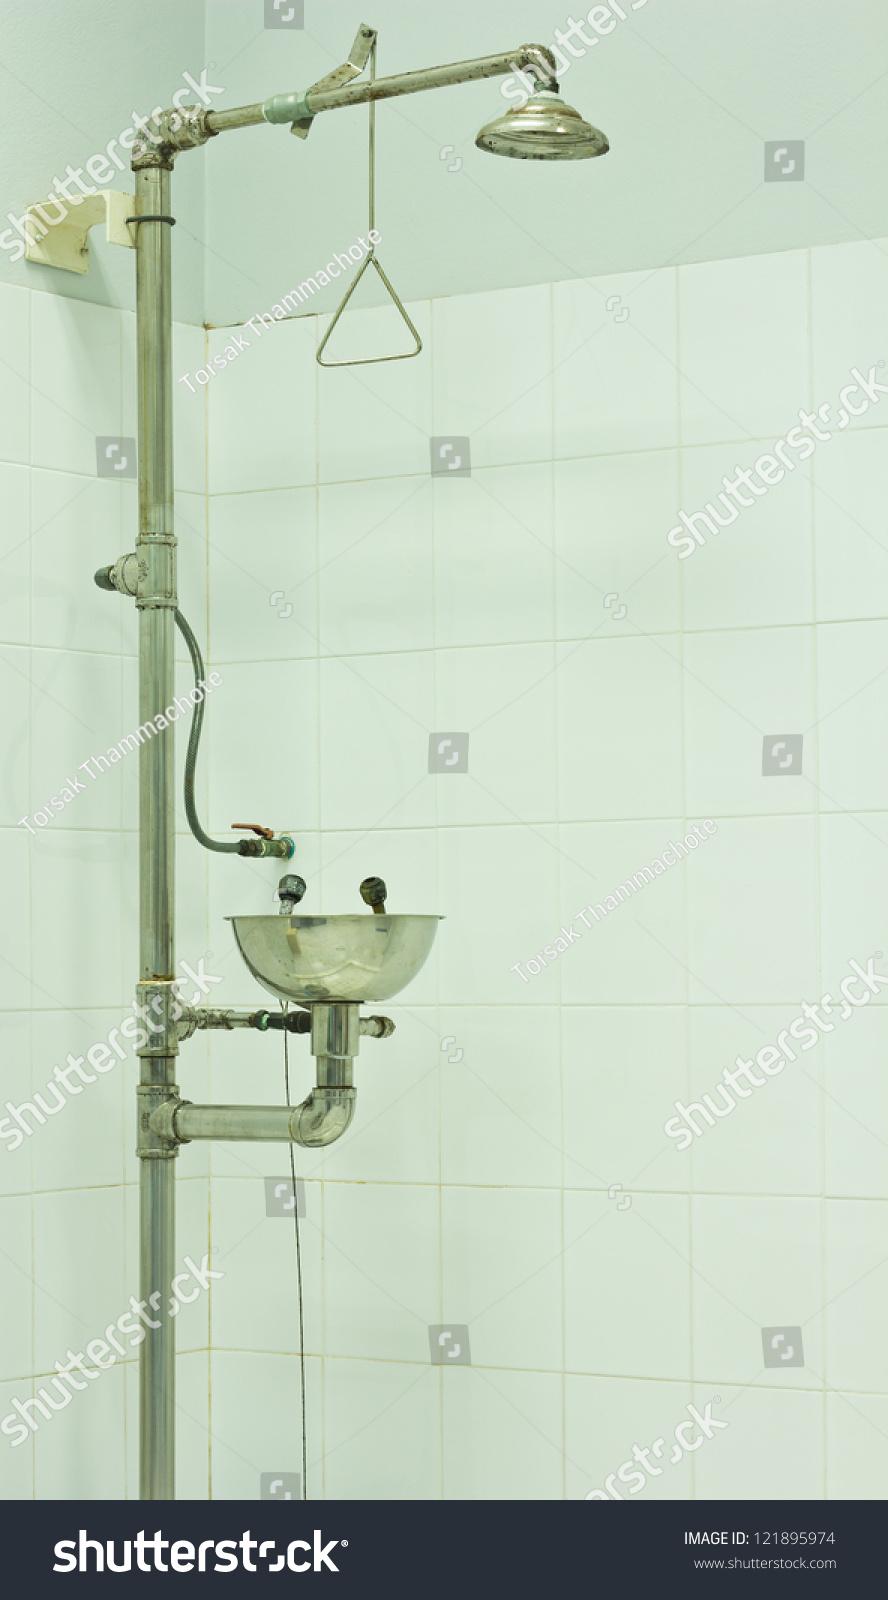 Emergency Safety Shower Laboratory Room Stock Photo (Royalty Free ...